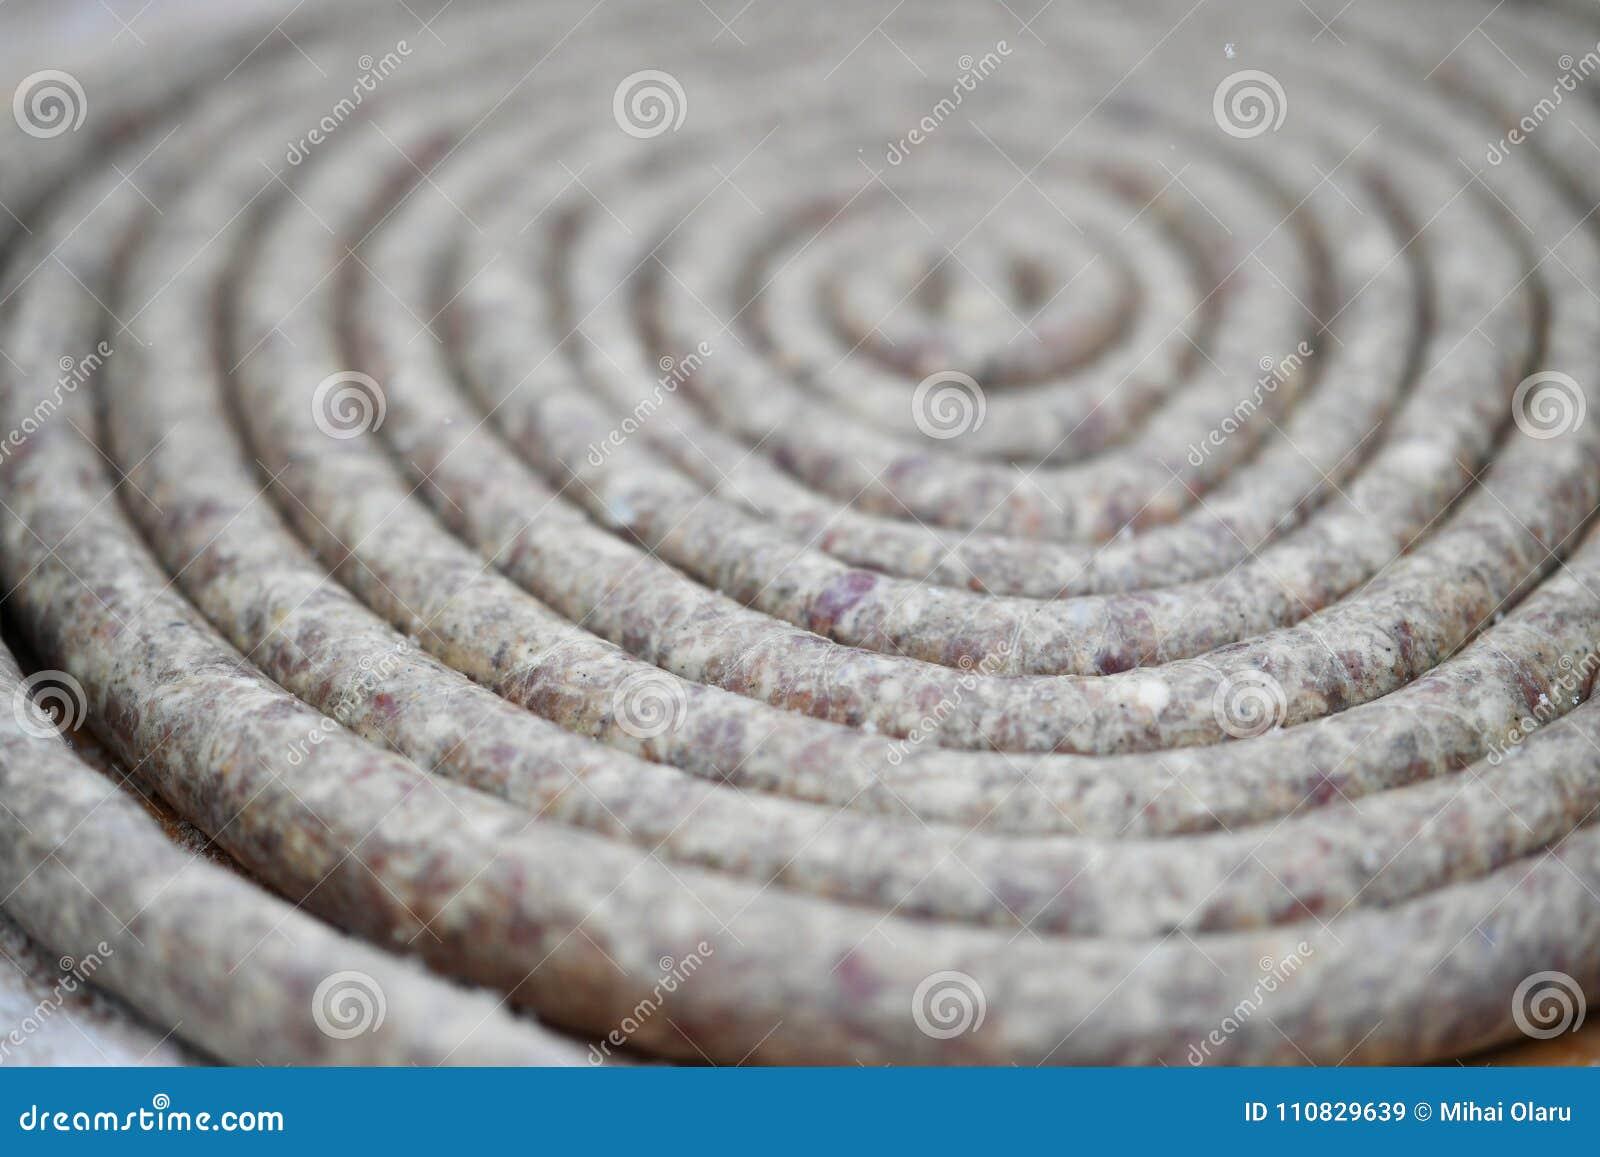 Salchicha en un espiral